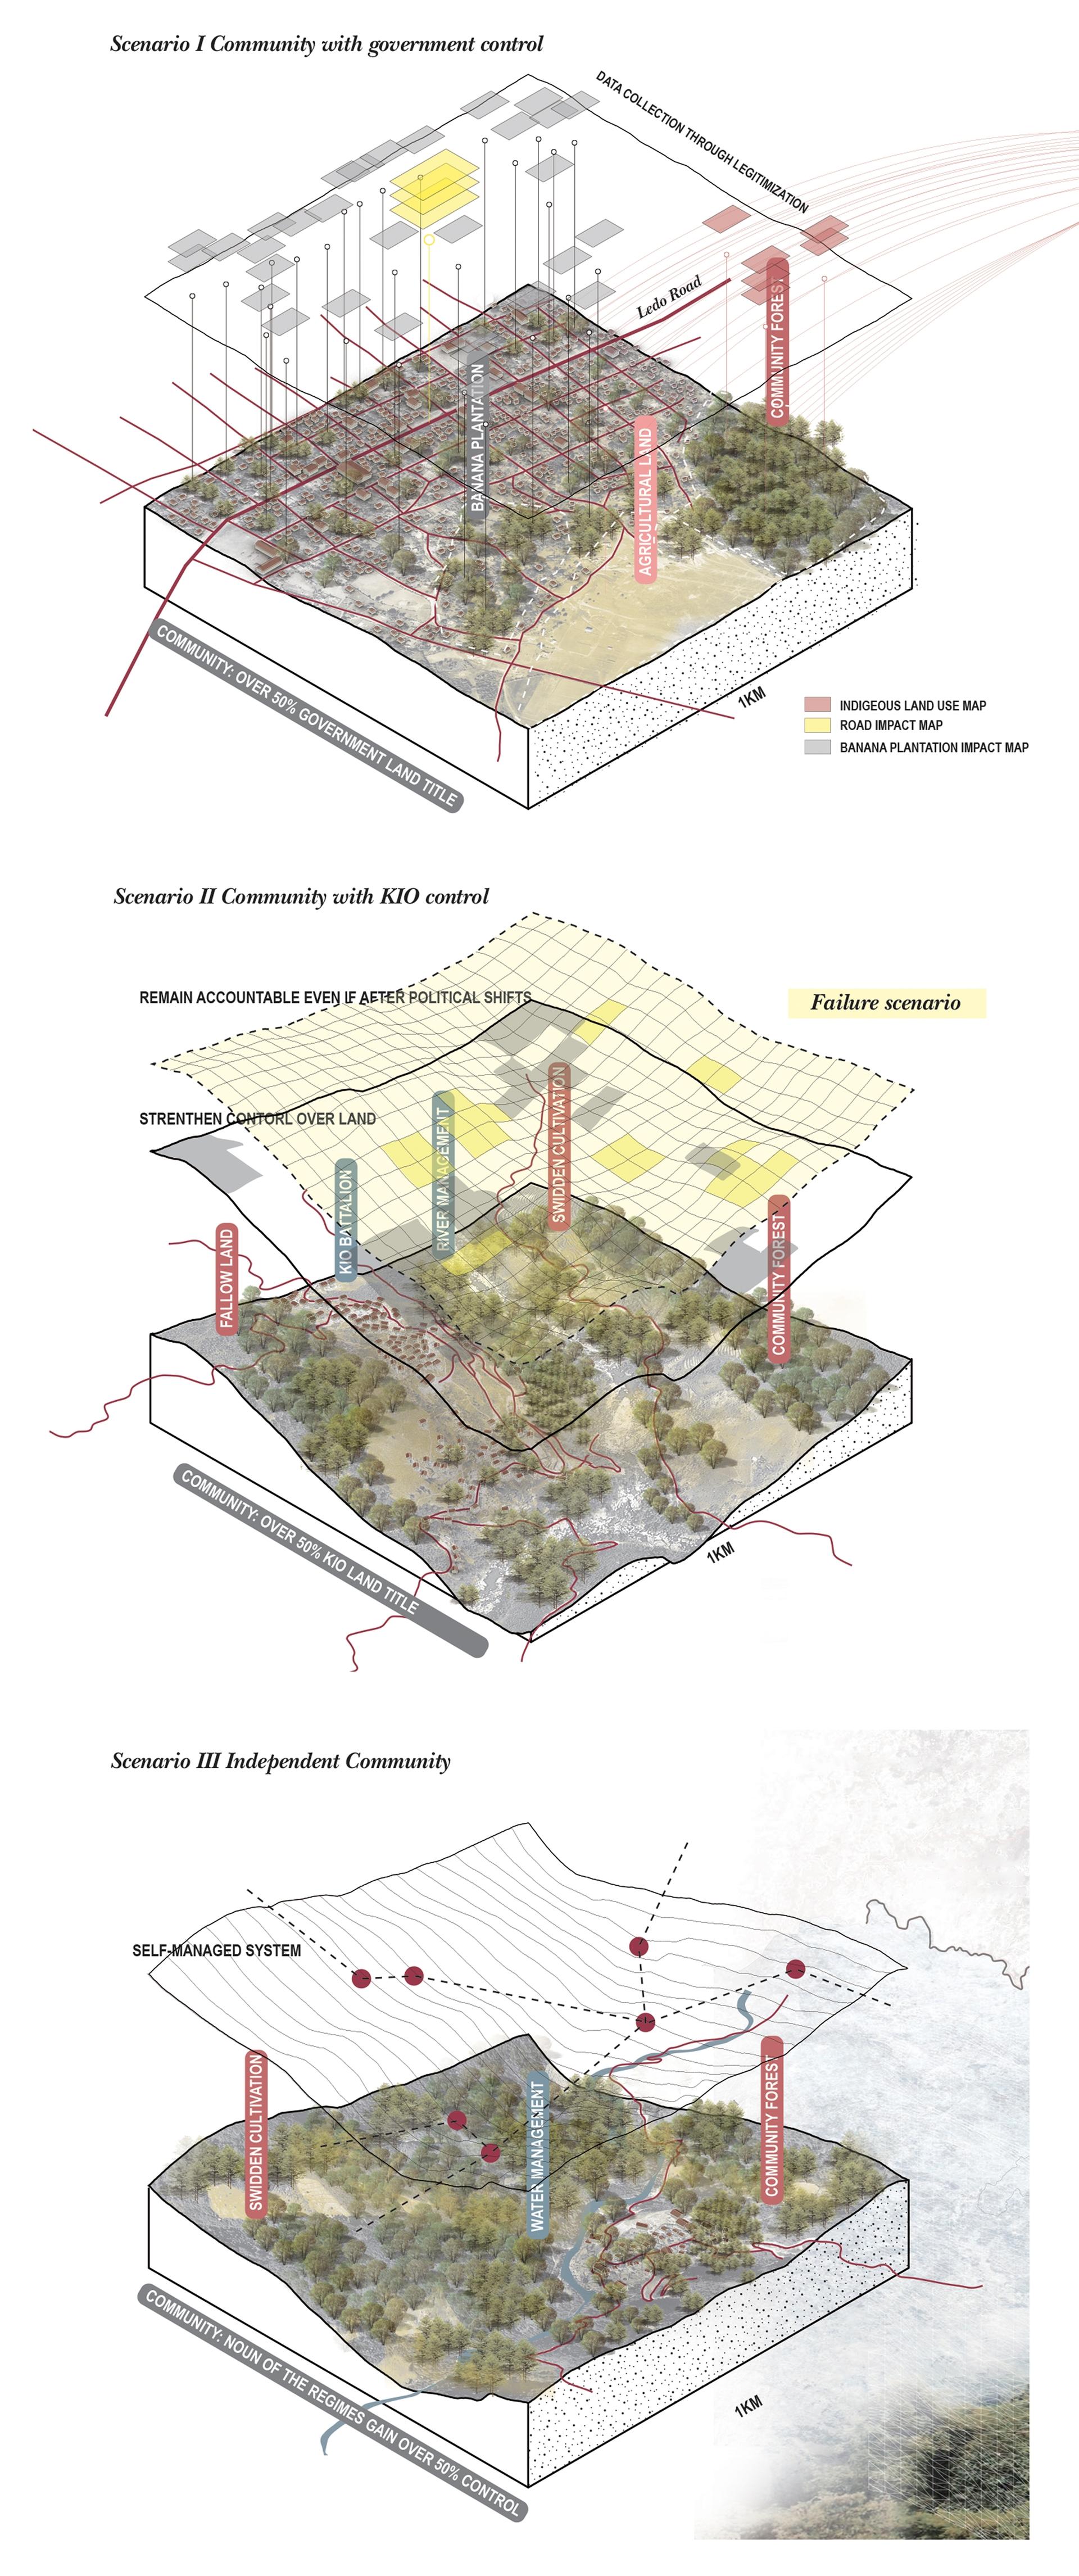 Enlarge Photo: Justifying Sustainability: Environmental governance and the legitimacy of environmental analysis along the Myanmar-China border. By YUAN Zheyi Zoey.